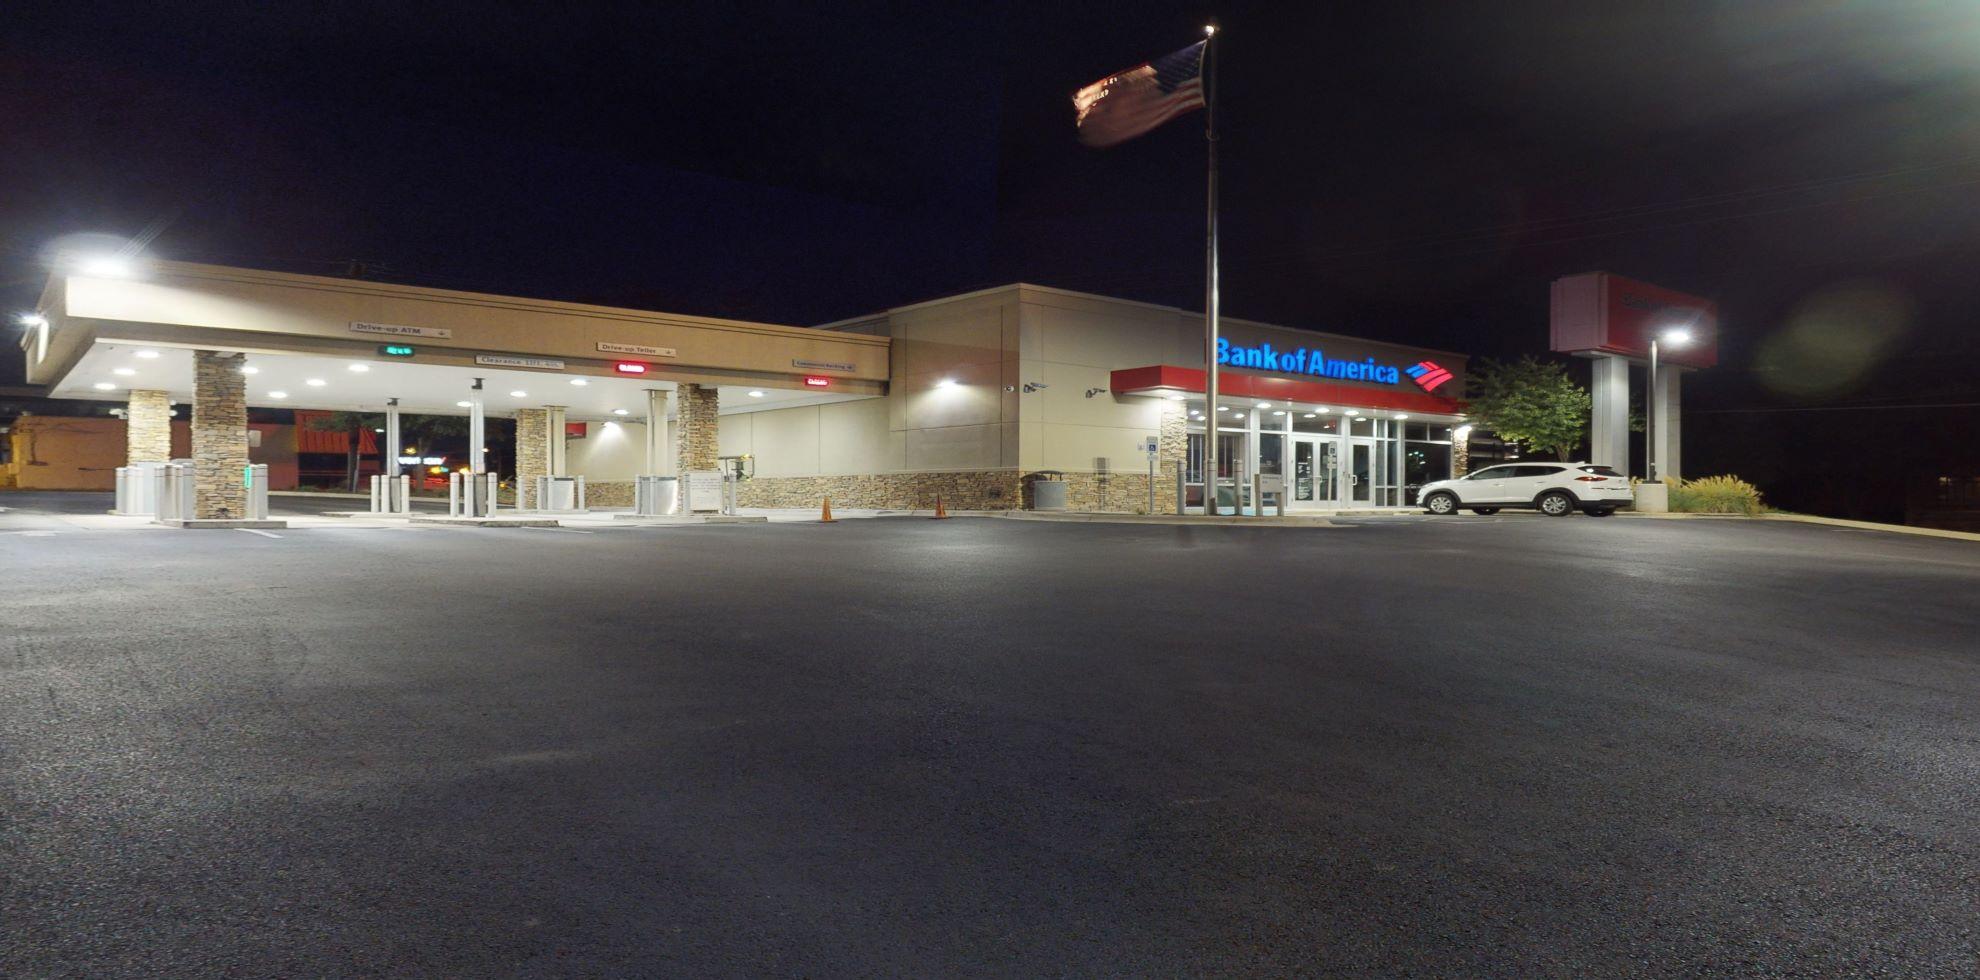 Bank of America financial center with drive-thru ATM and teller | 3520 N Lamar Blvd, Austin, TX 78705